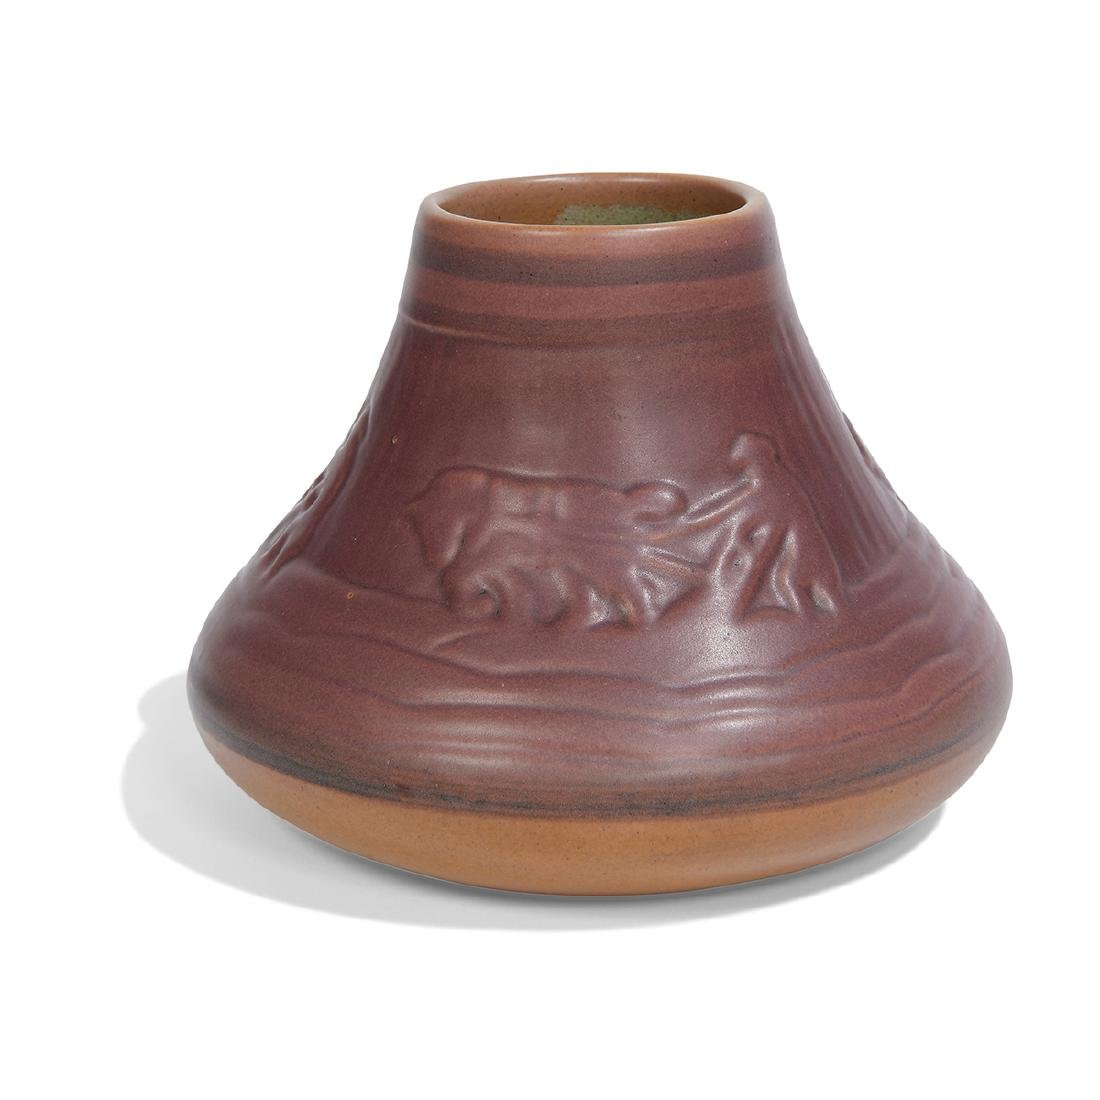 University of ND, School of Mines, Plowman Vase